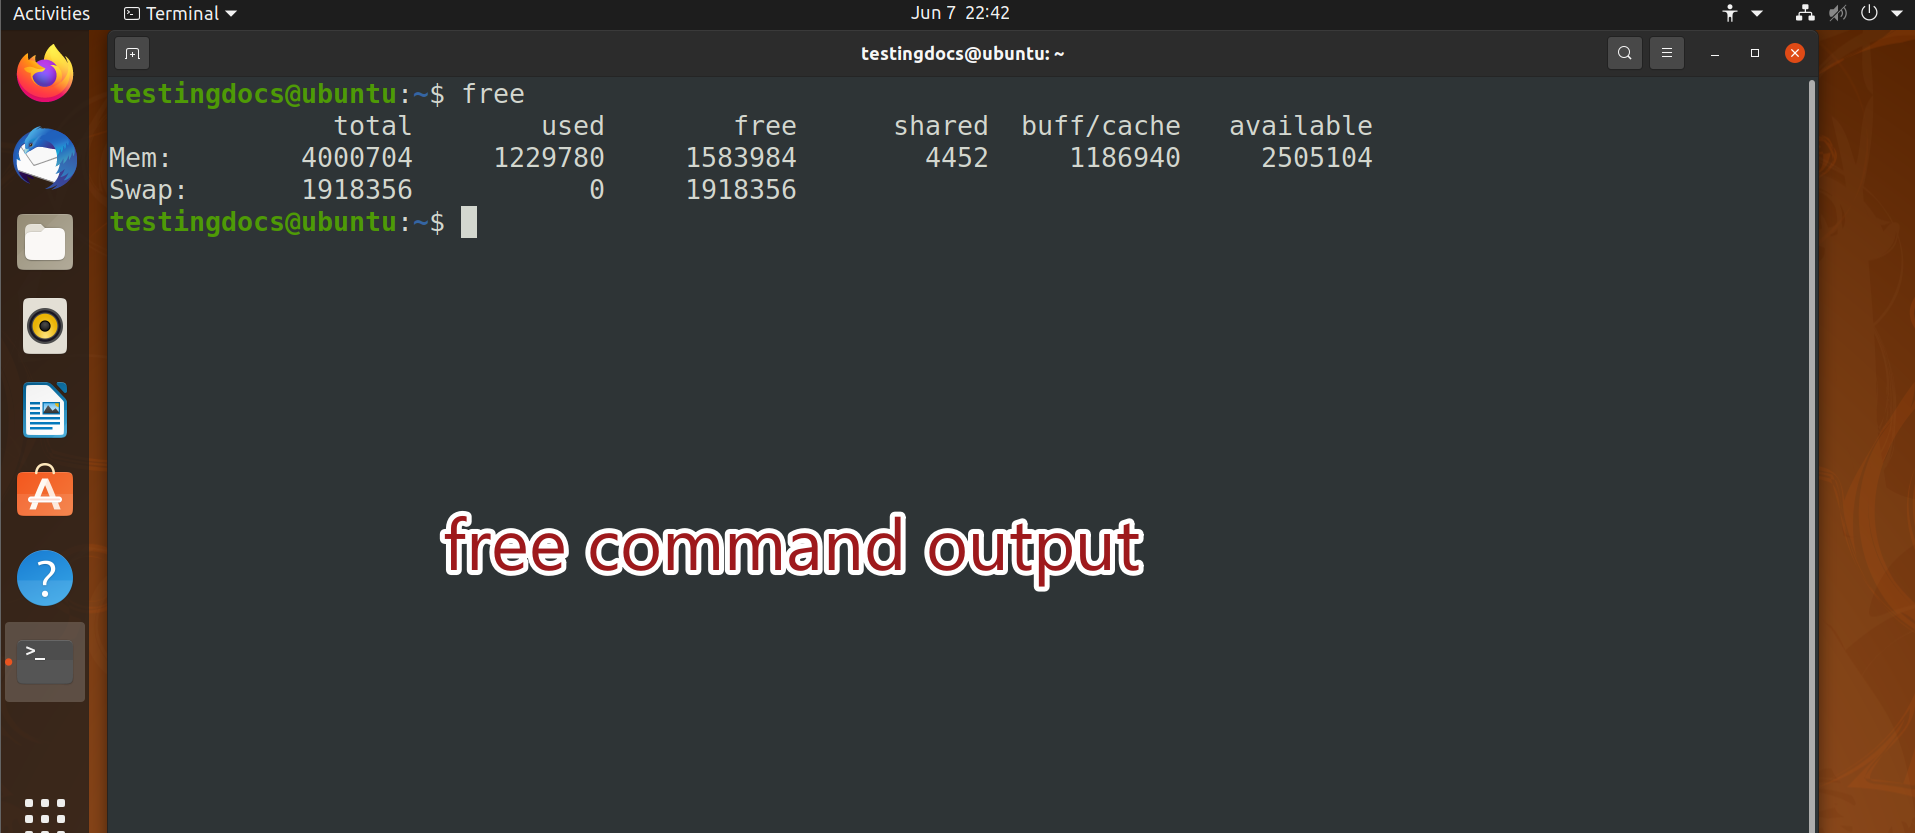 free command output